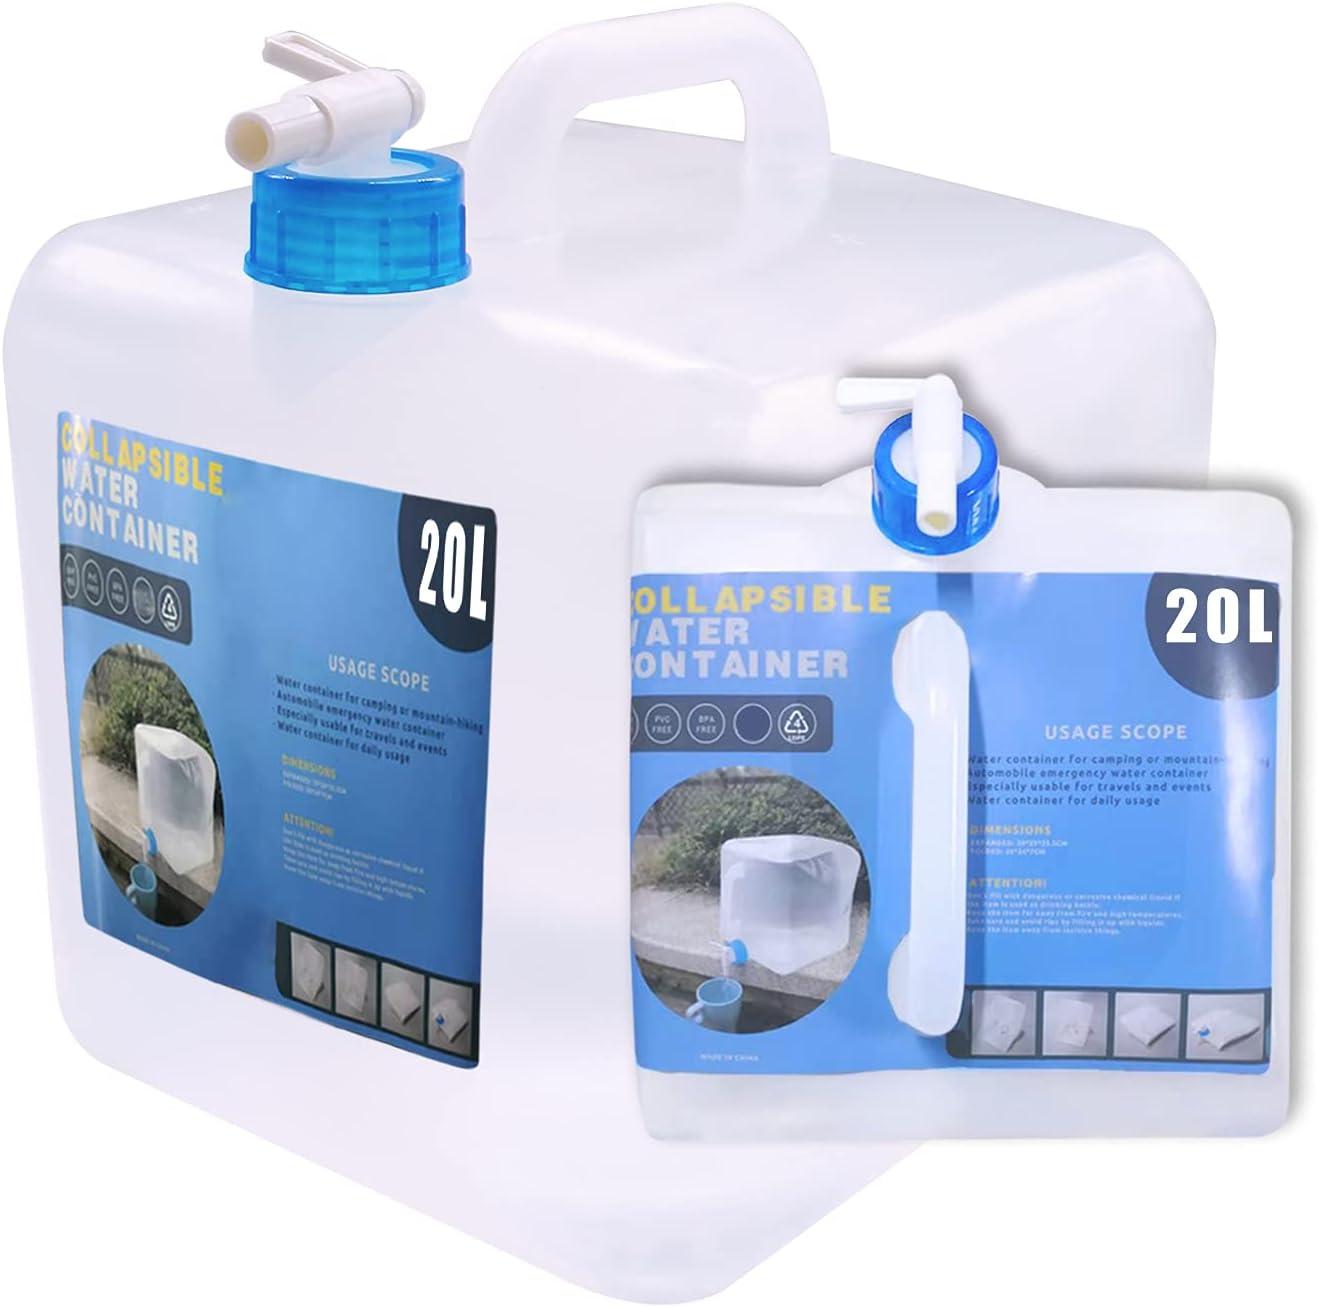 Environmental-friendly Water Bucket Outdoor Camping Water Dispensing Bottle